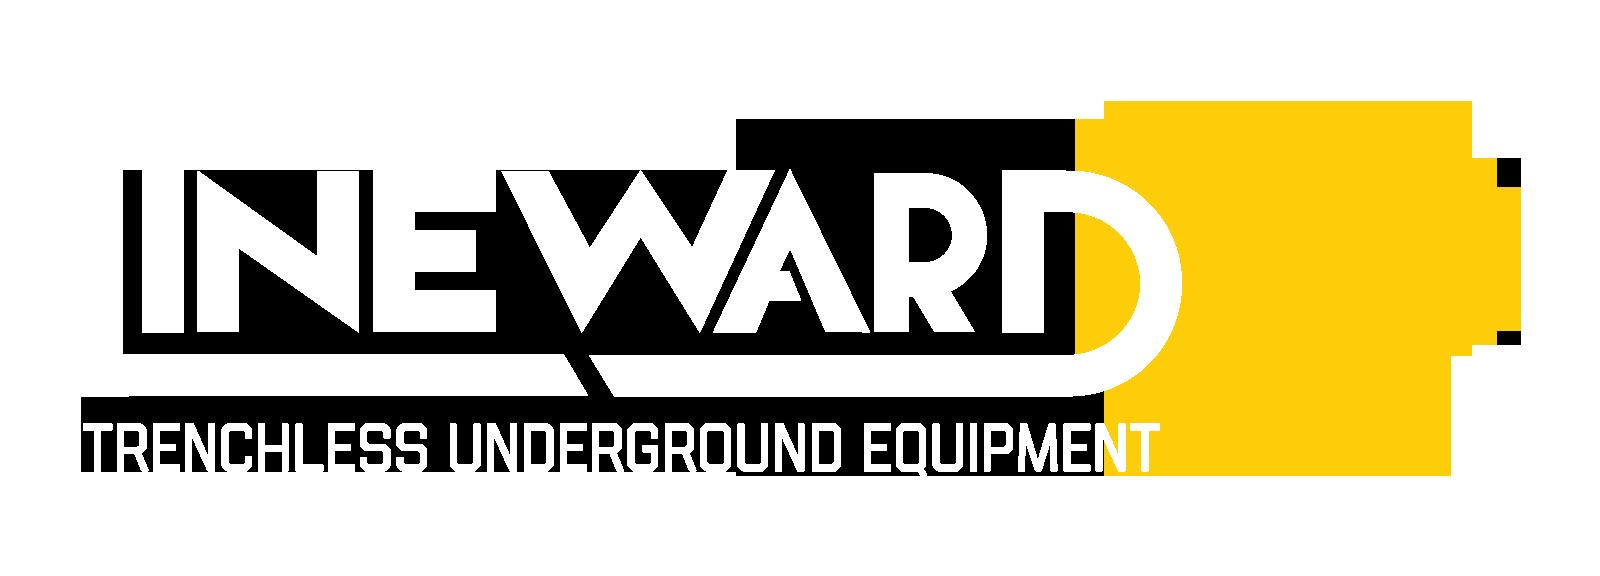 Lineward logo